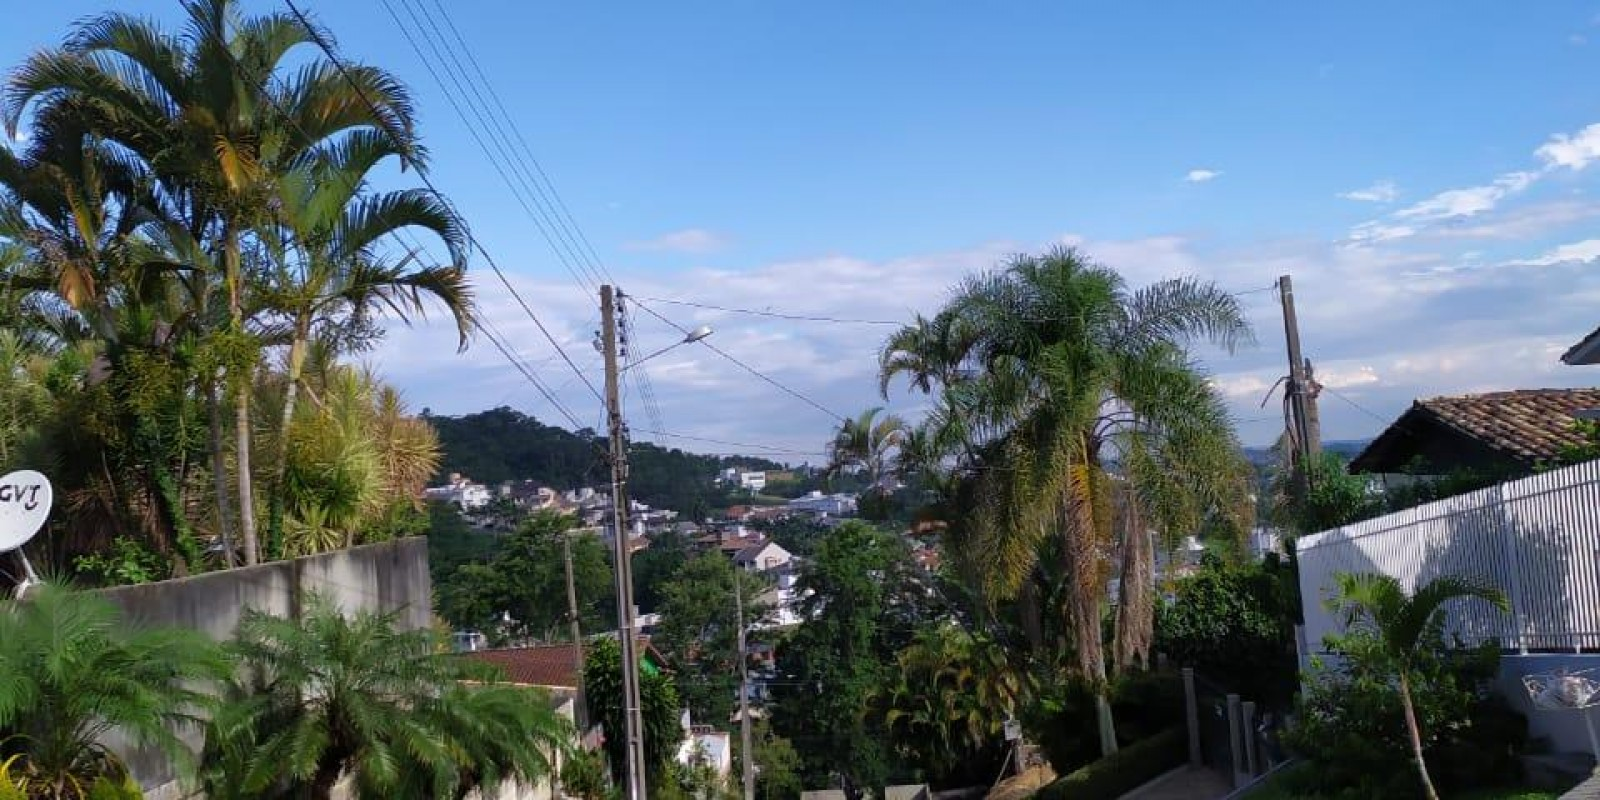 CASA MINA BRASIL - Foto 3 de 7